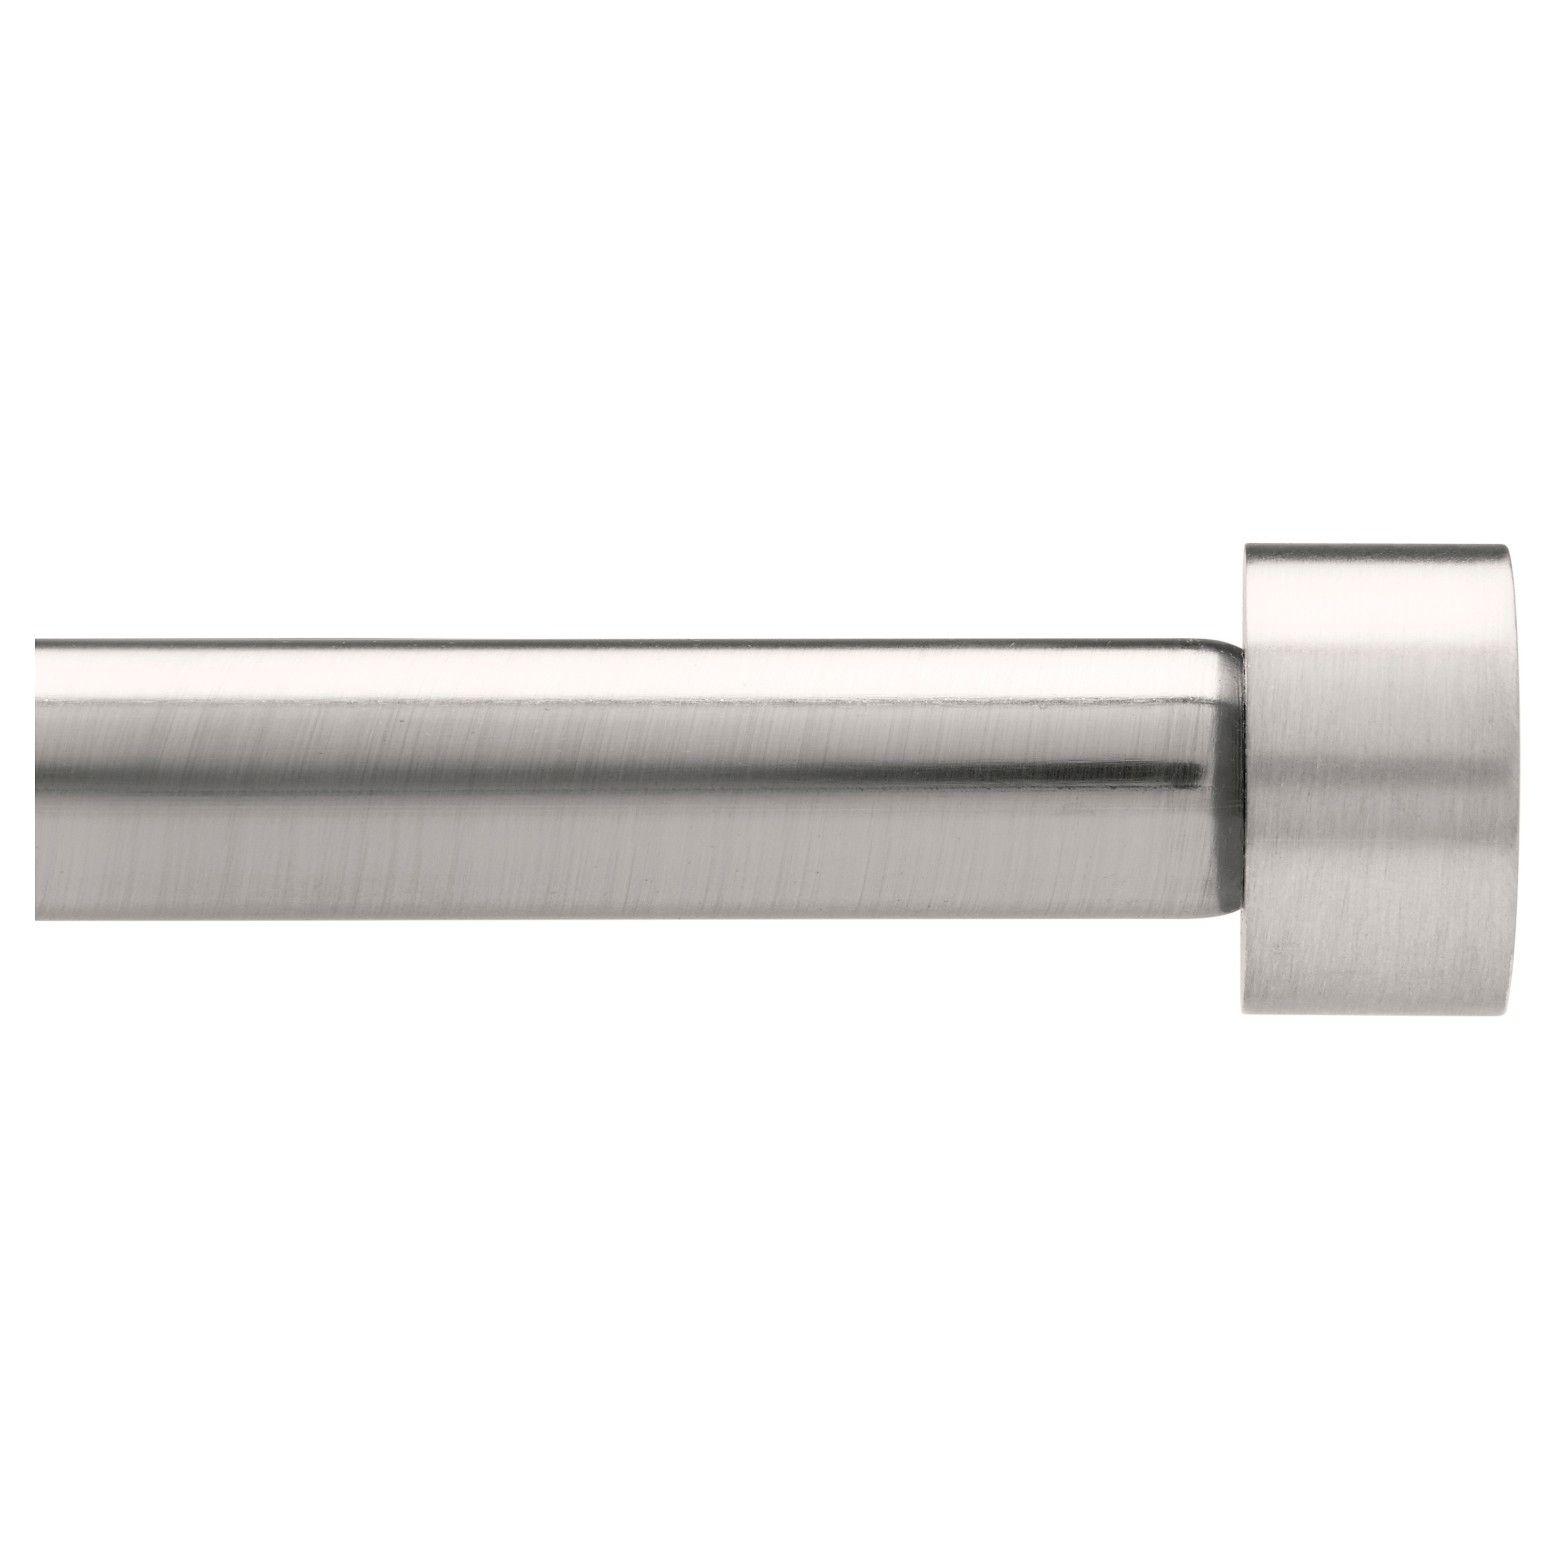 Dauntless Curtain Rod Set Brushed Nickel 1 66 X120 Loft By